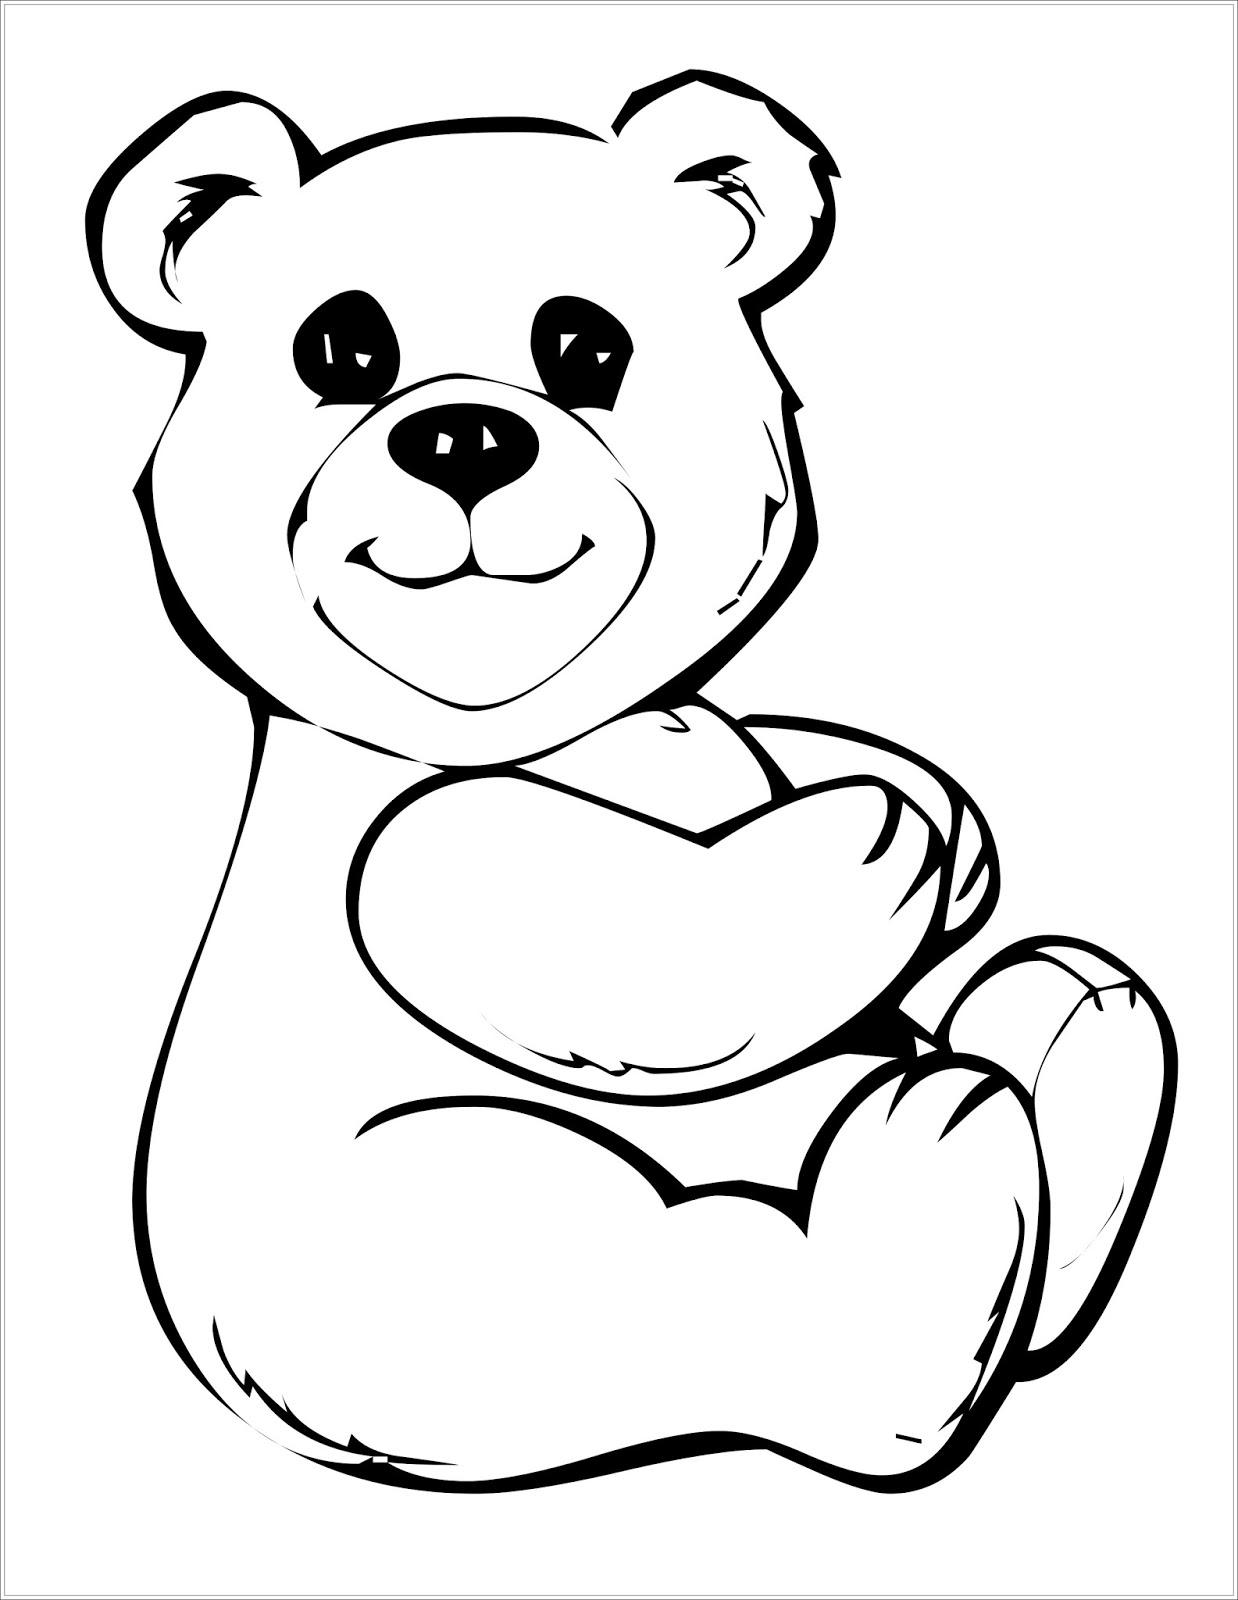 20 ideen für teddybär ausmalbilder - beste wohnkultur